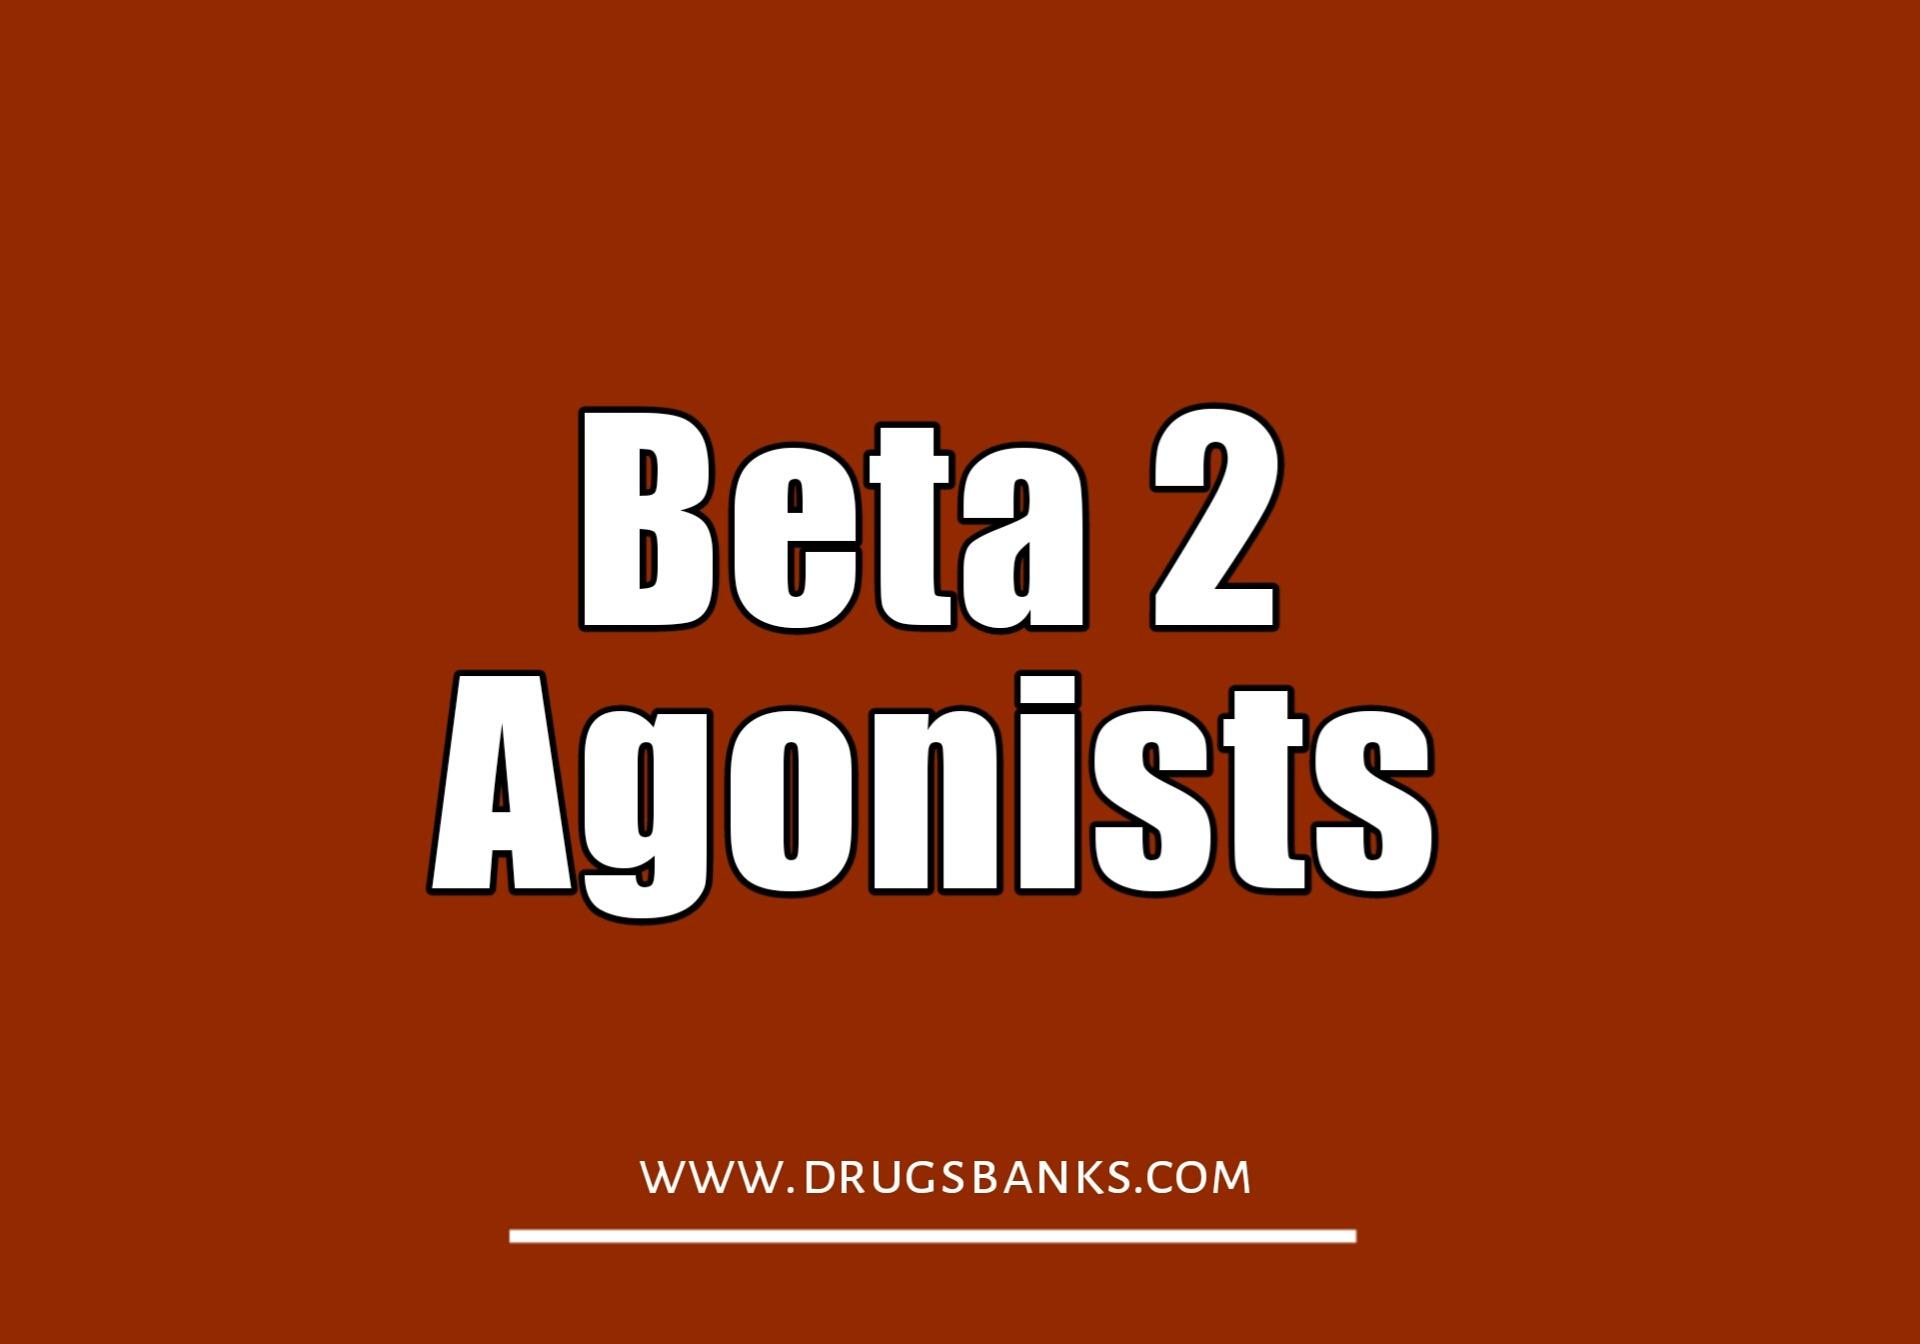 Beta 2 Agonist